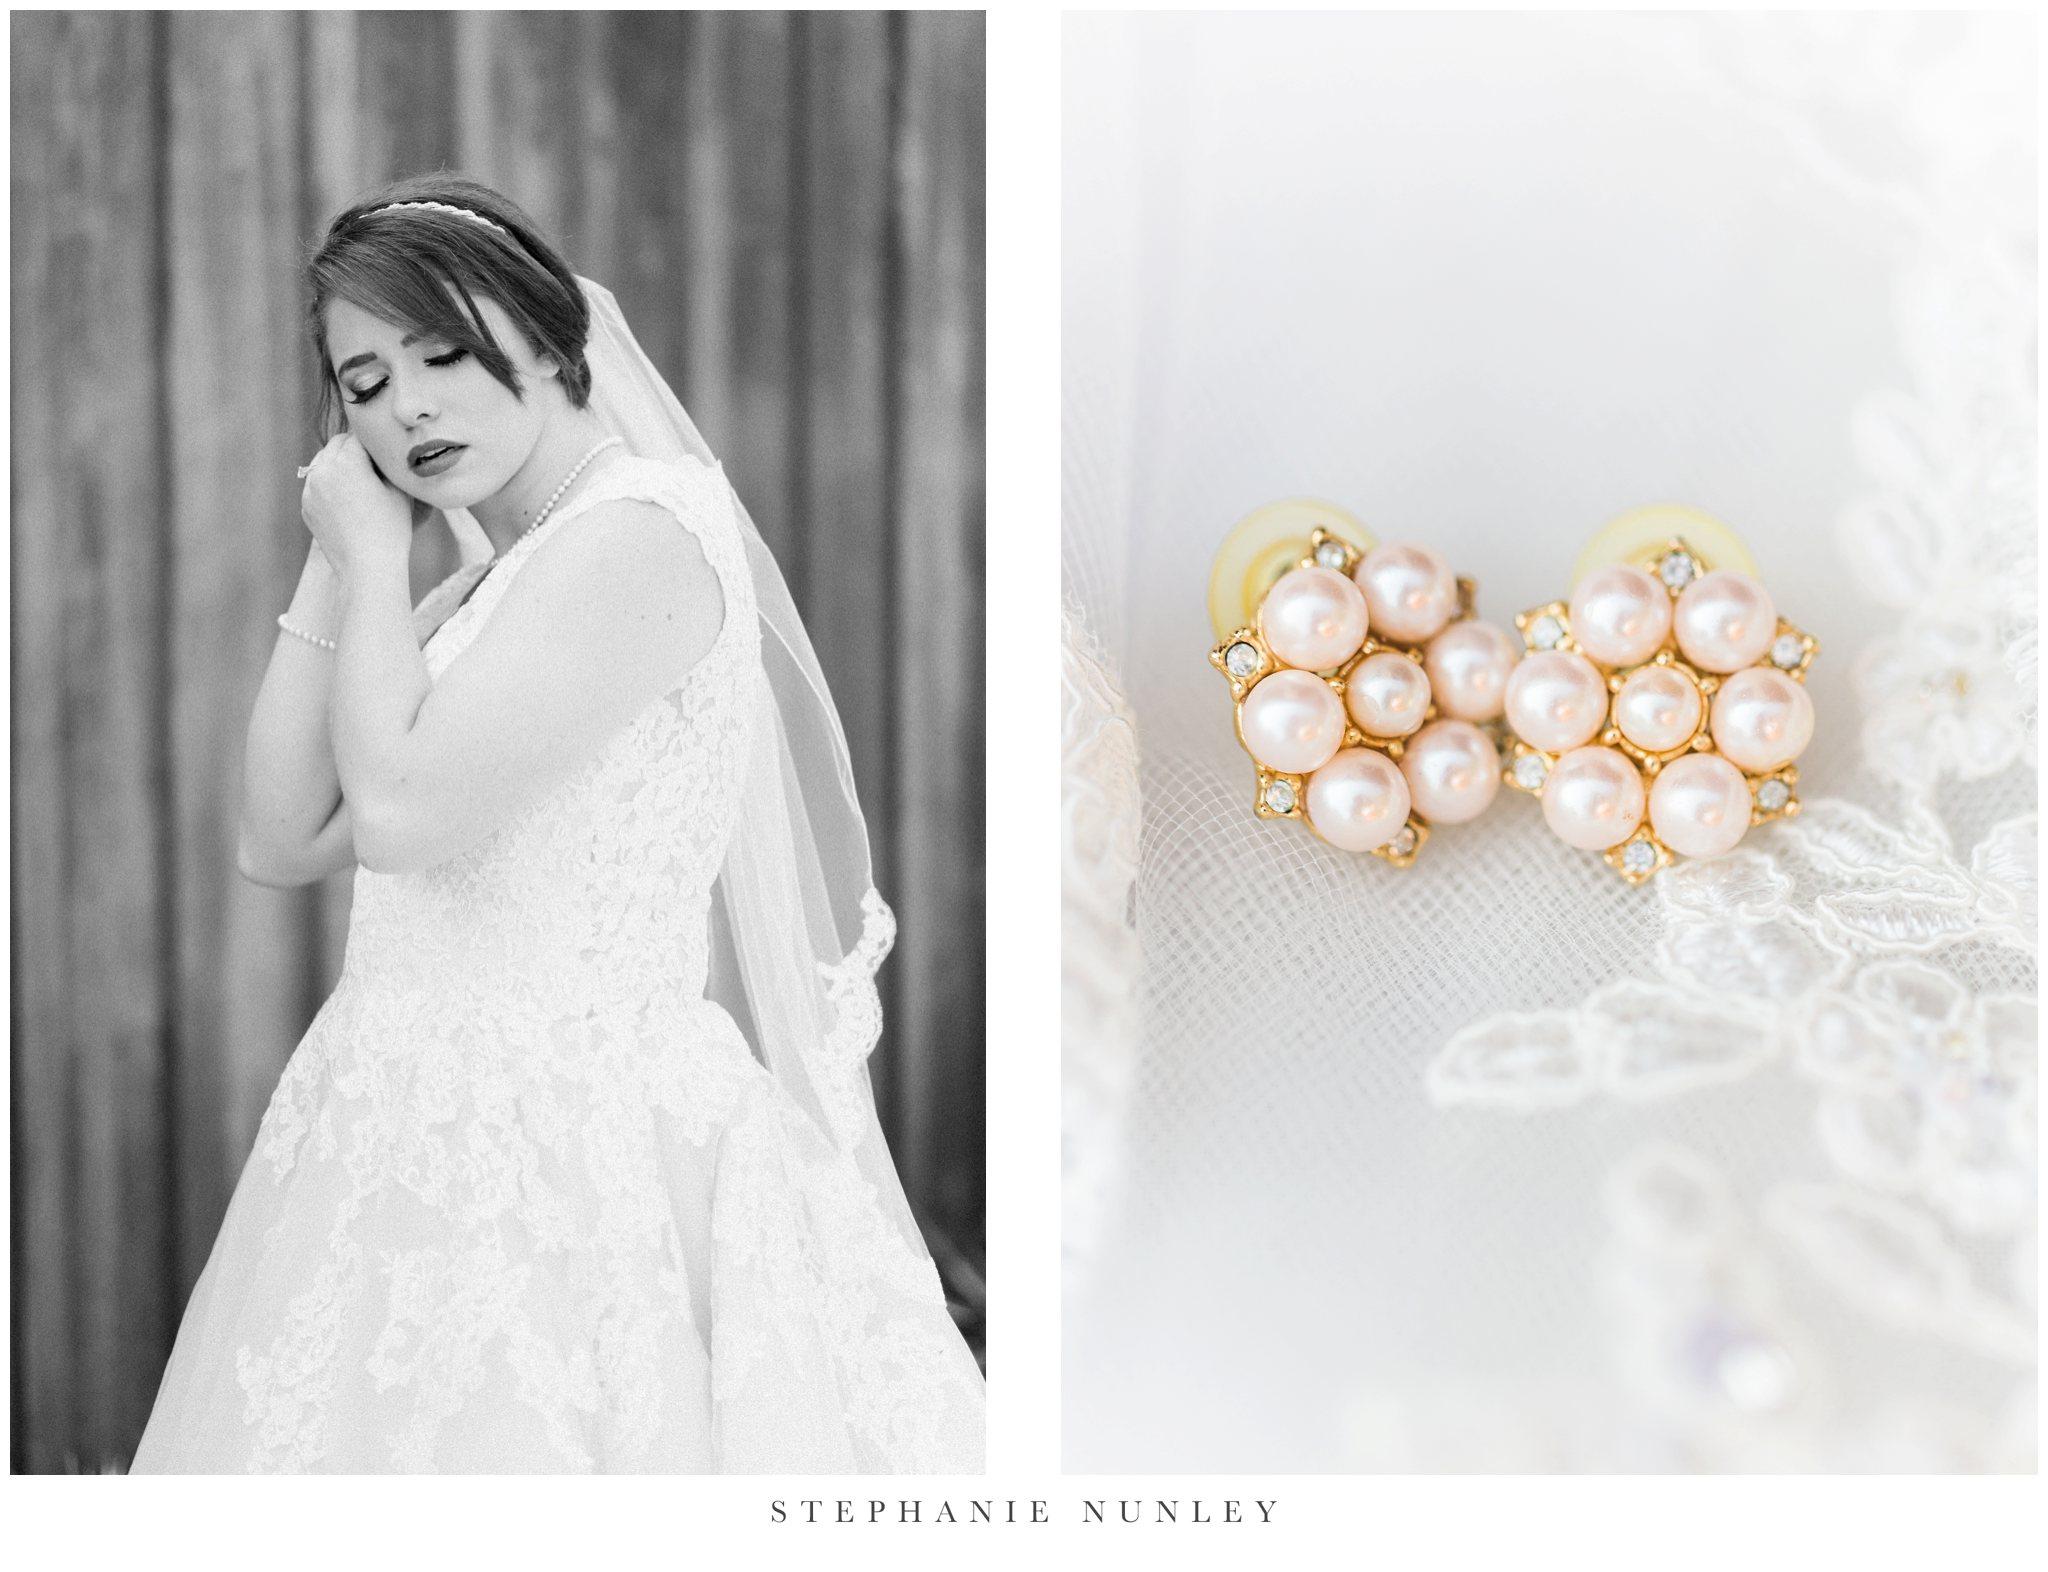 arkansas-wedding-with-lush-wildflower-bouquet-0034.jpg